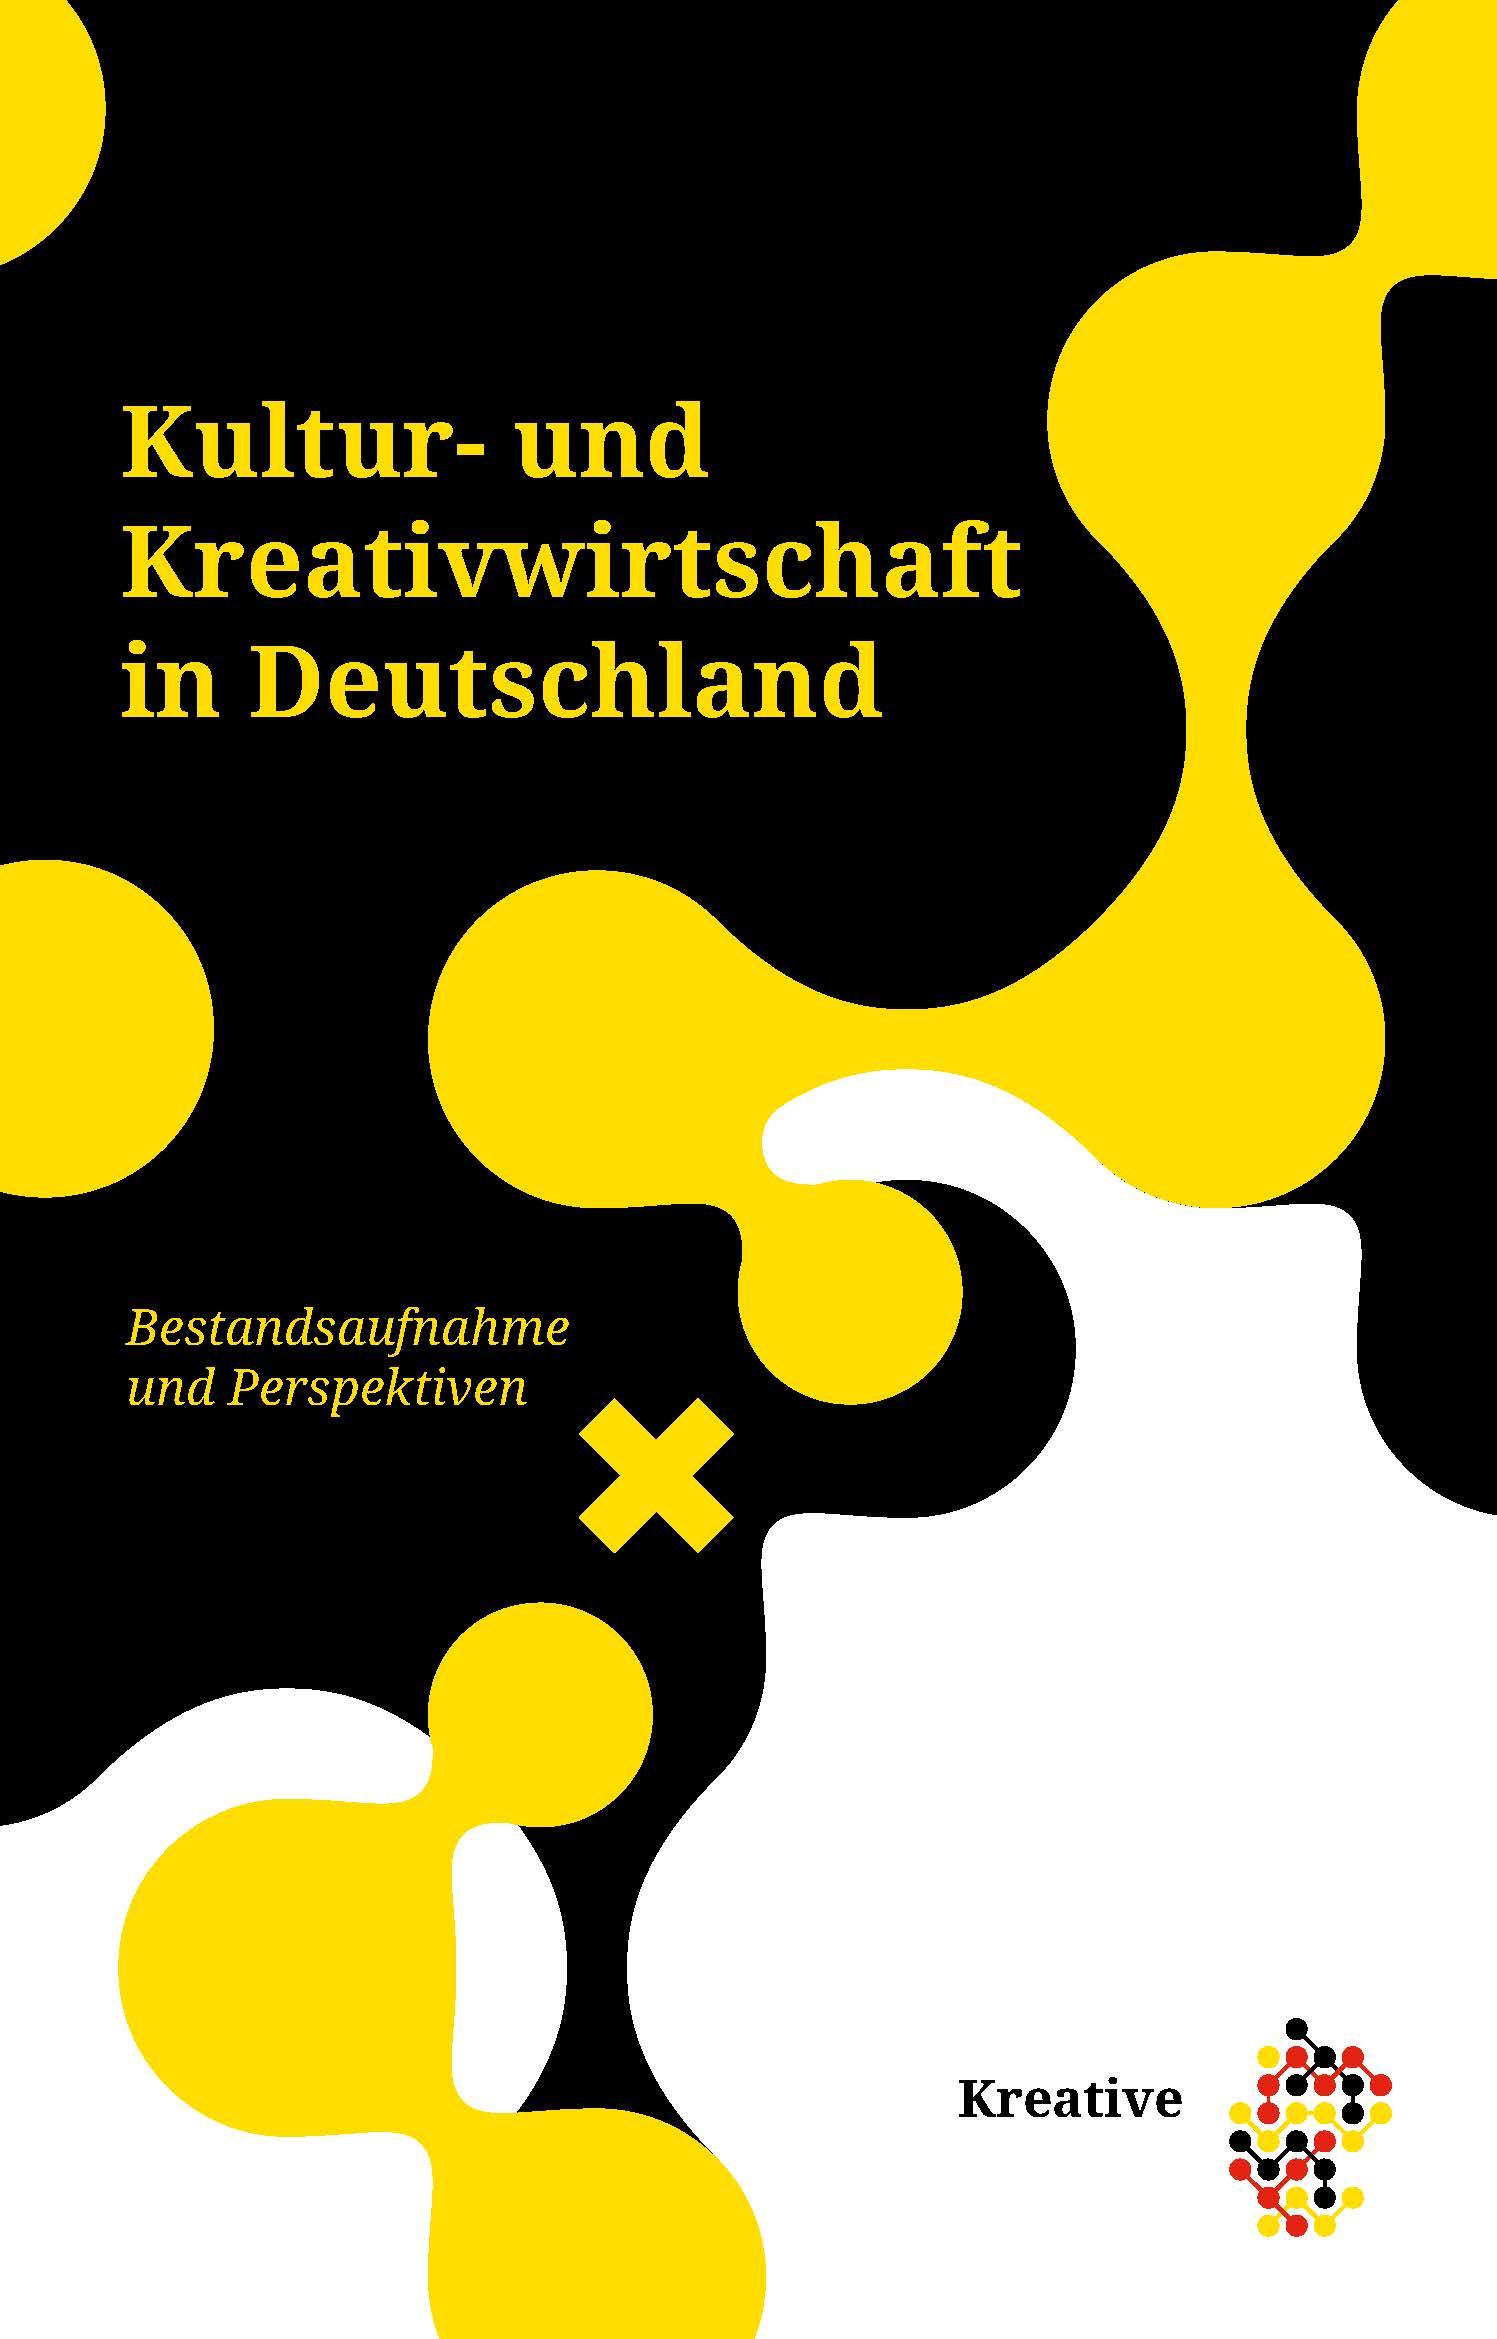 KKW-in-Deutschland-Bestandsaufnahme Perspektiven